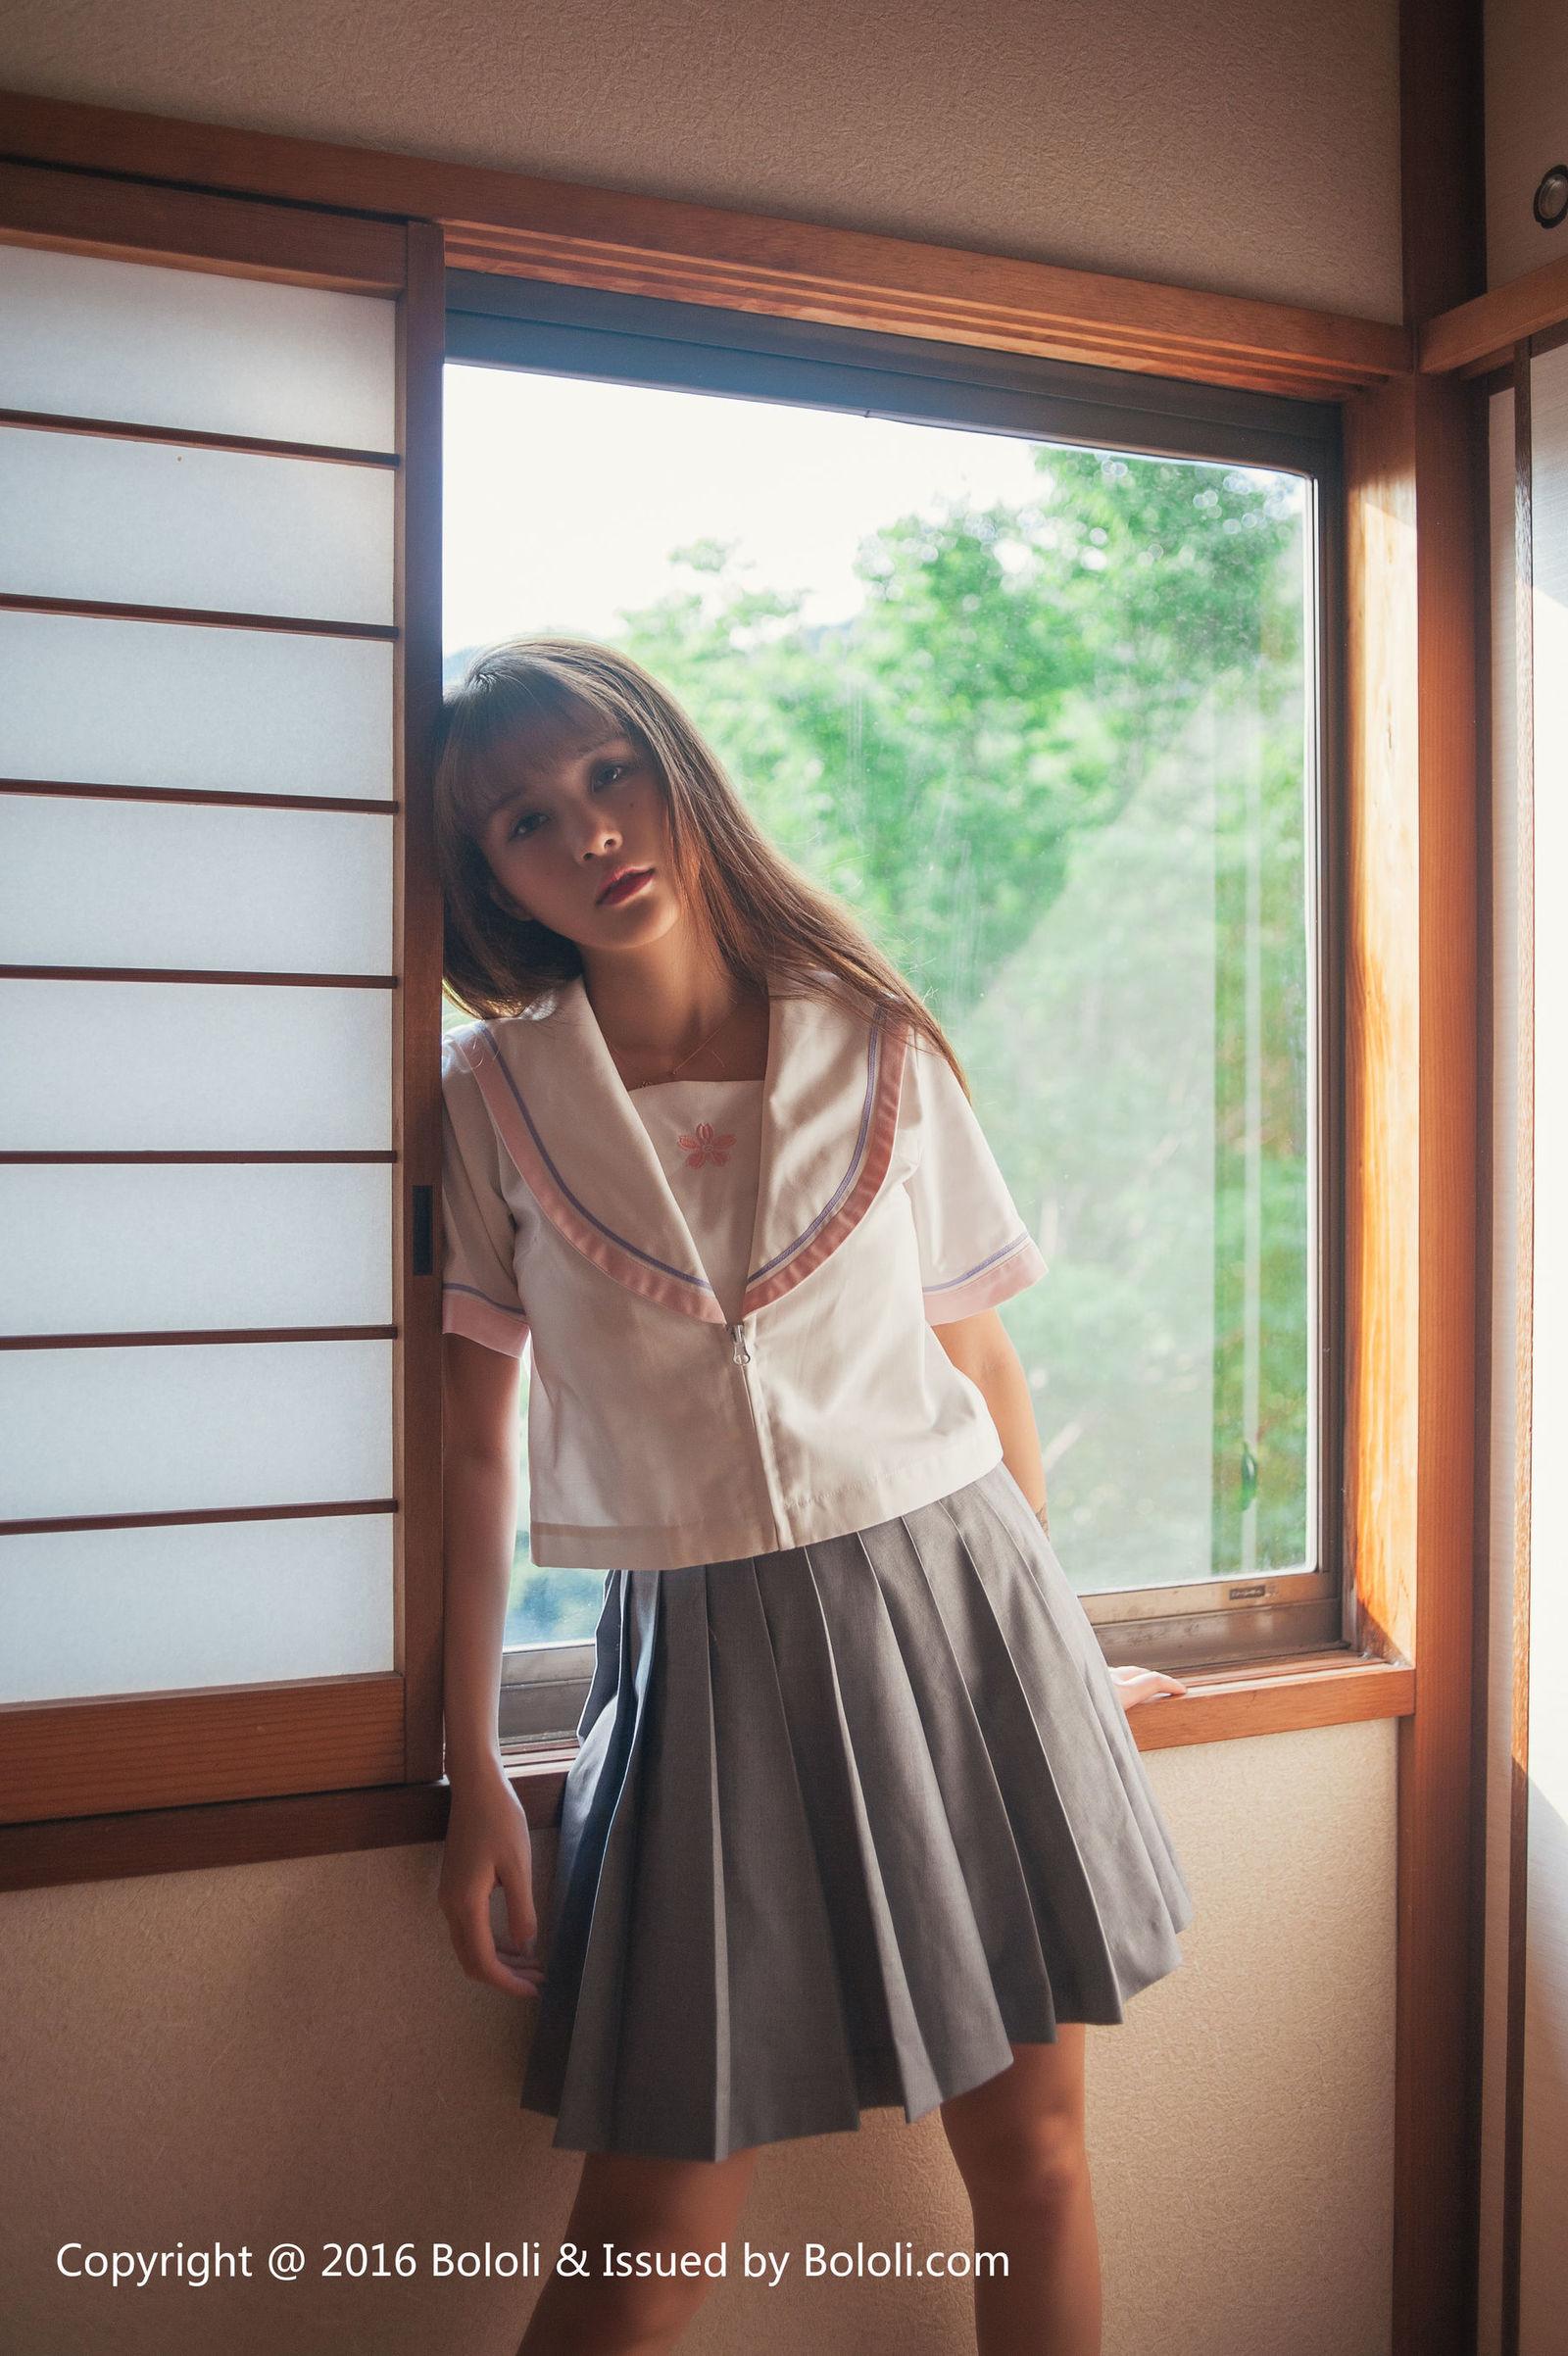 [Bololi波萝社] BOL.082 放課後の夏美酱 丝袜美图[59P]